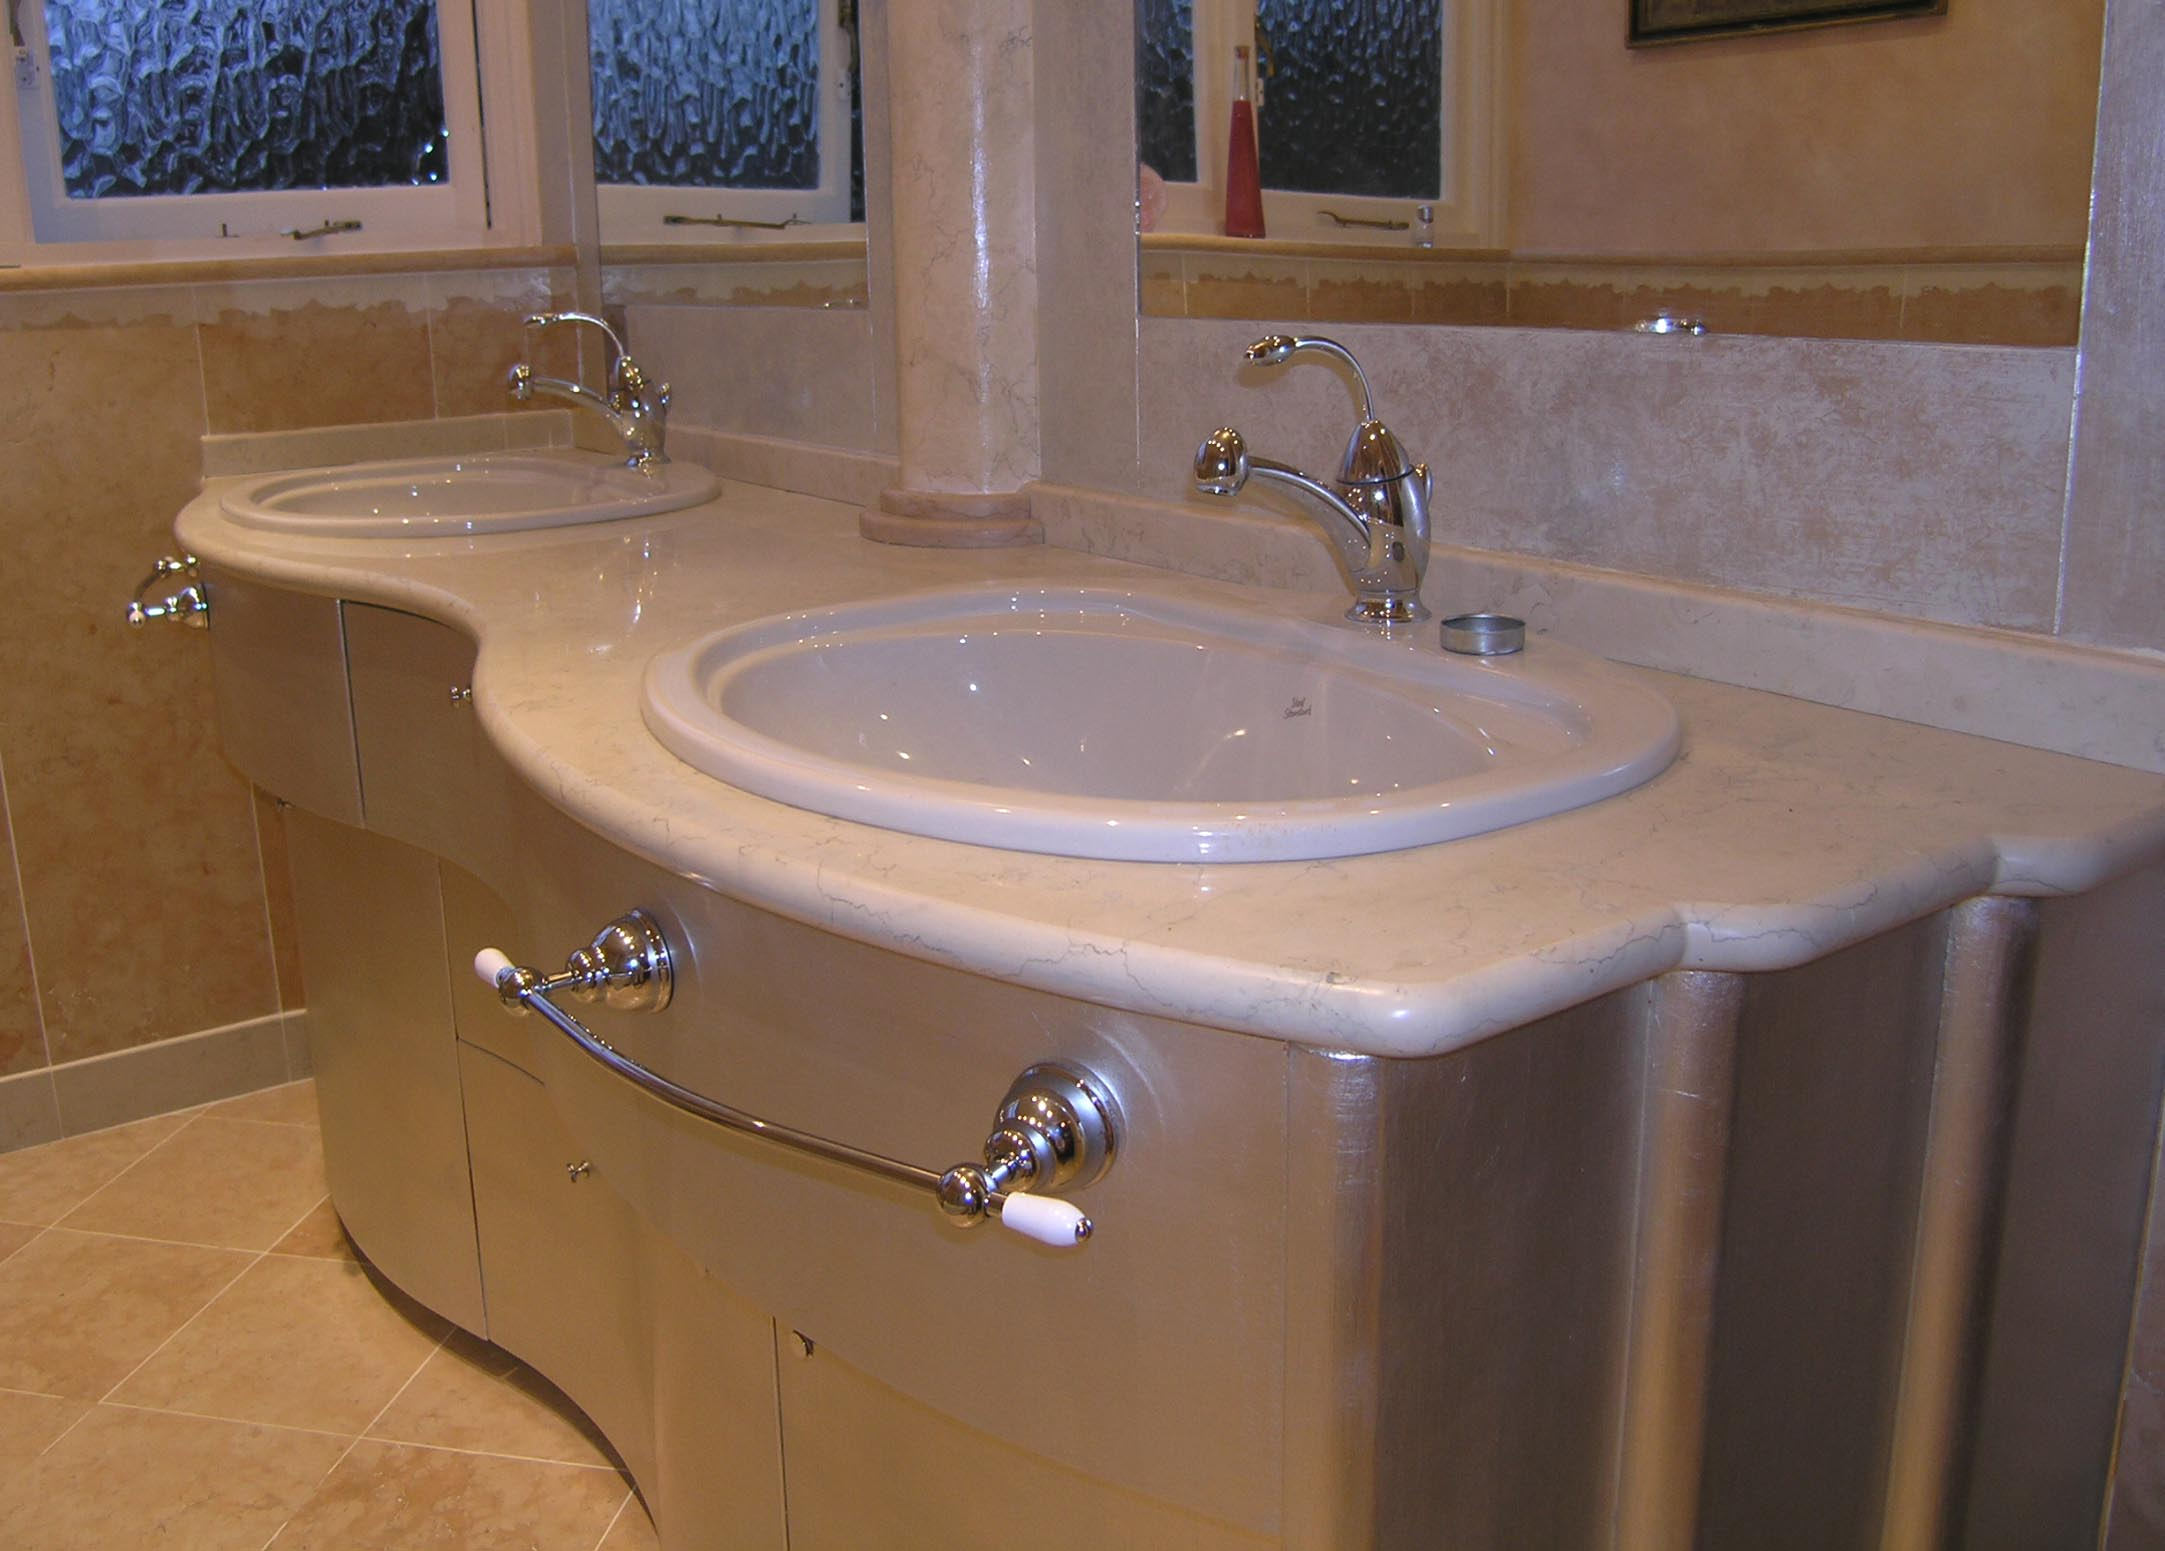 Art deco style bathroom furniture gilded and varnished.